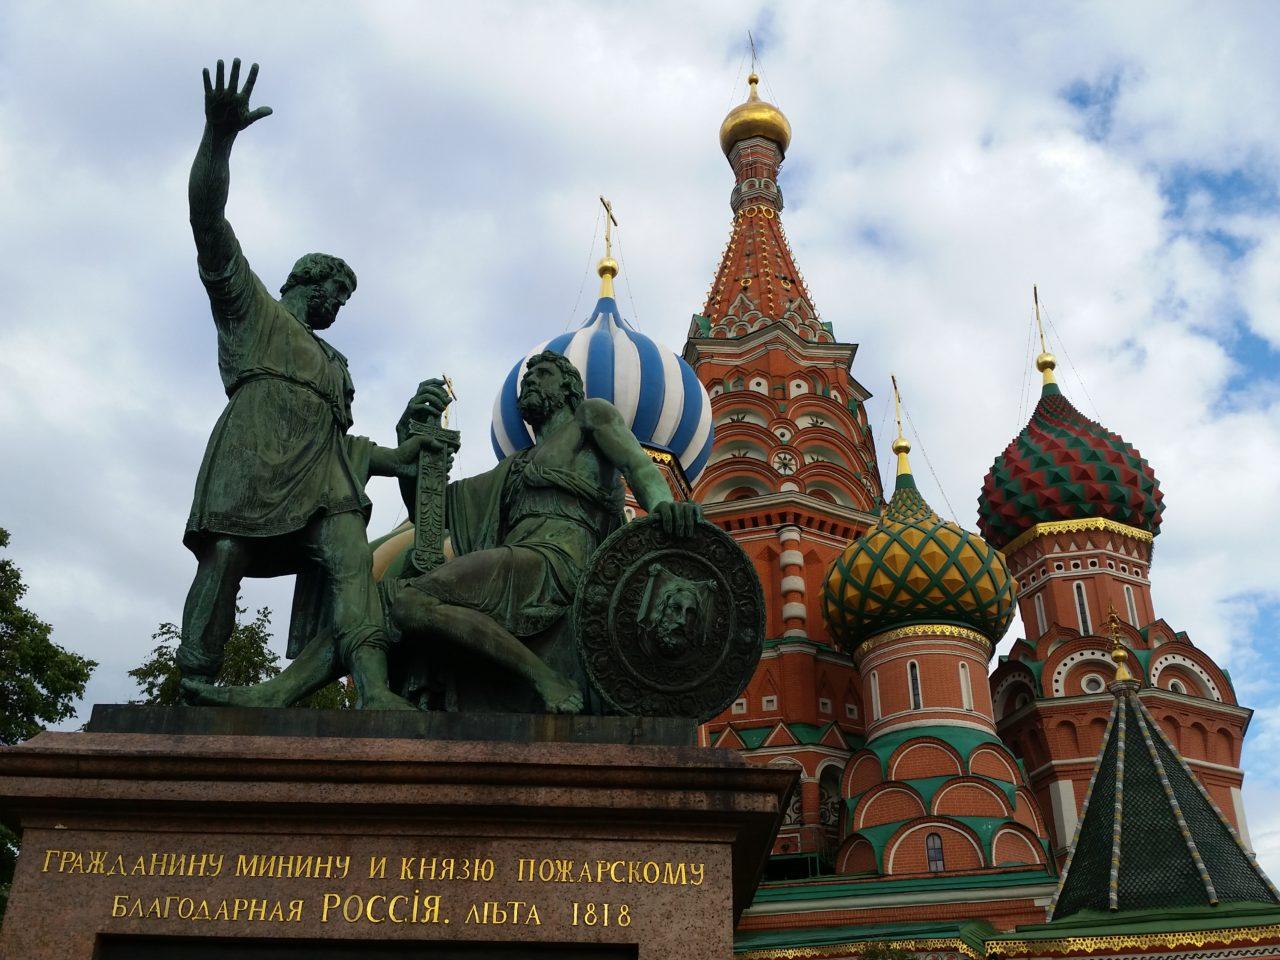 Ein Moskauer Touri-Klassiker: die Basilius-Kathedrale am Roten Platz / Peggy Lohse